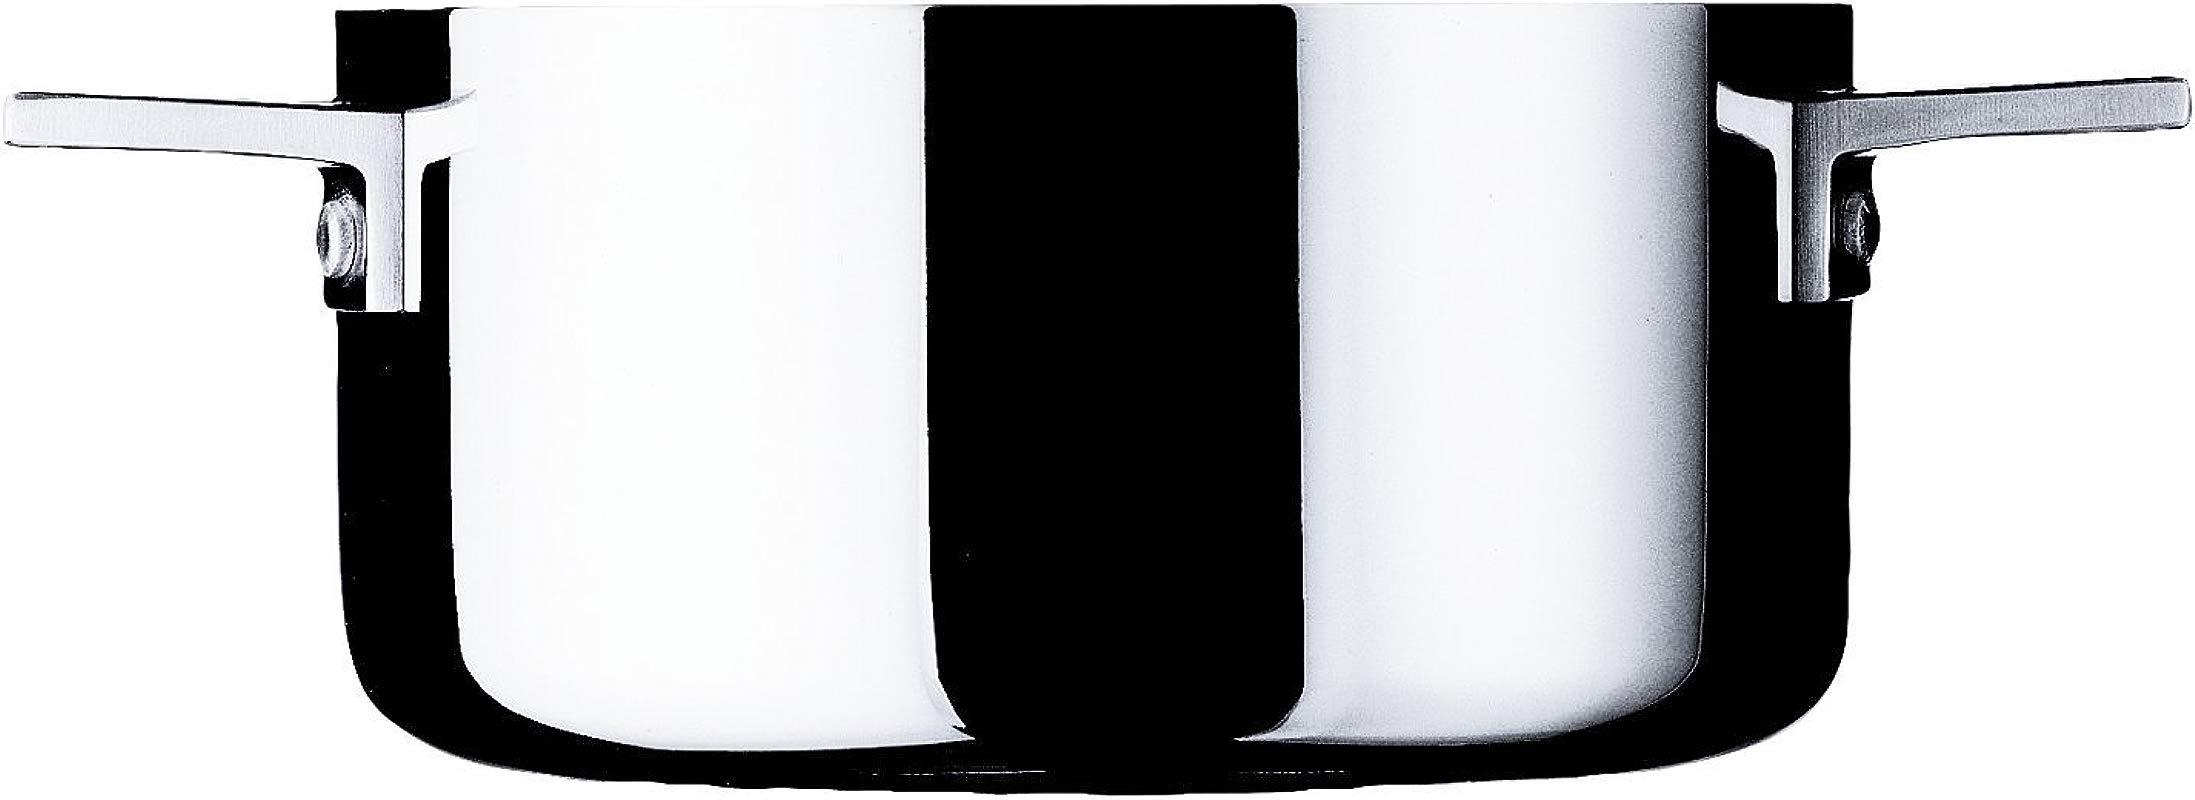 Mepra Attiva Casserole 22cm